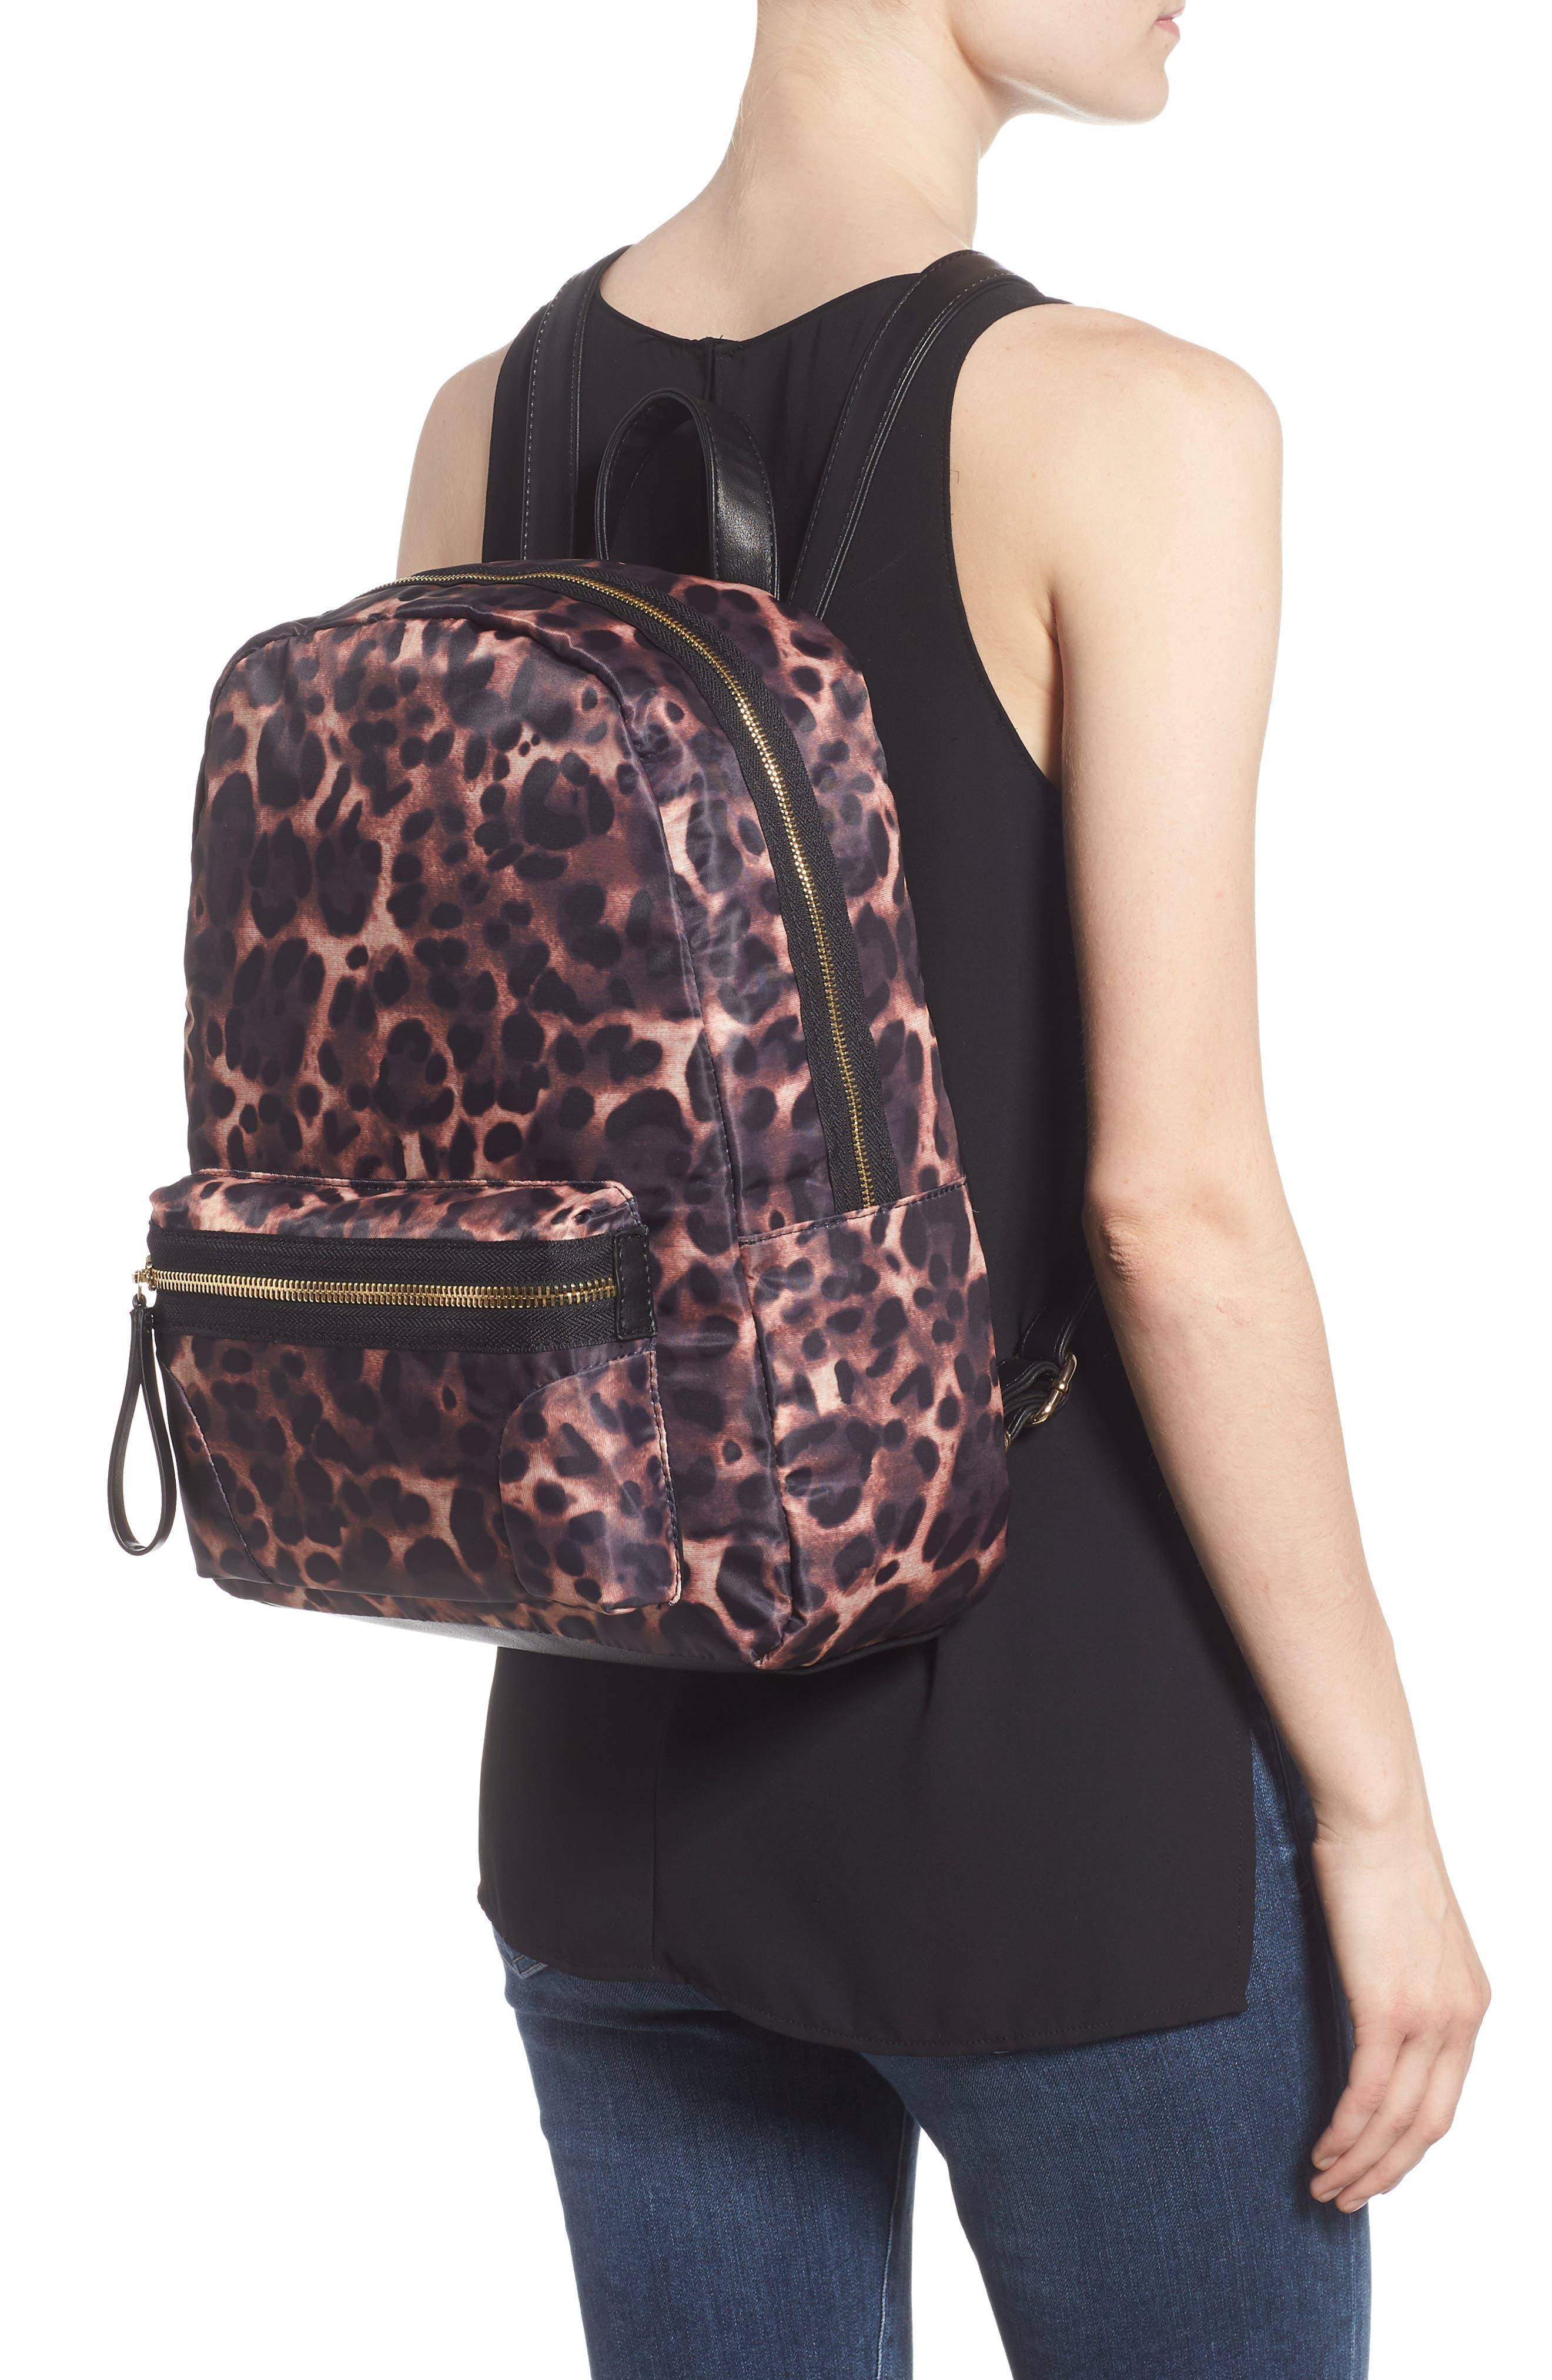 Leopard Print Nylon Backpack,                             Alternate thumbnail 2, color,                             Leopard